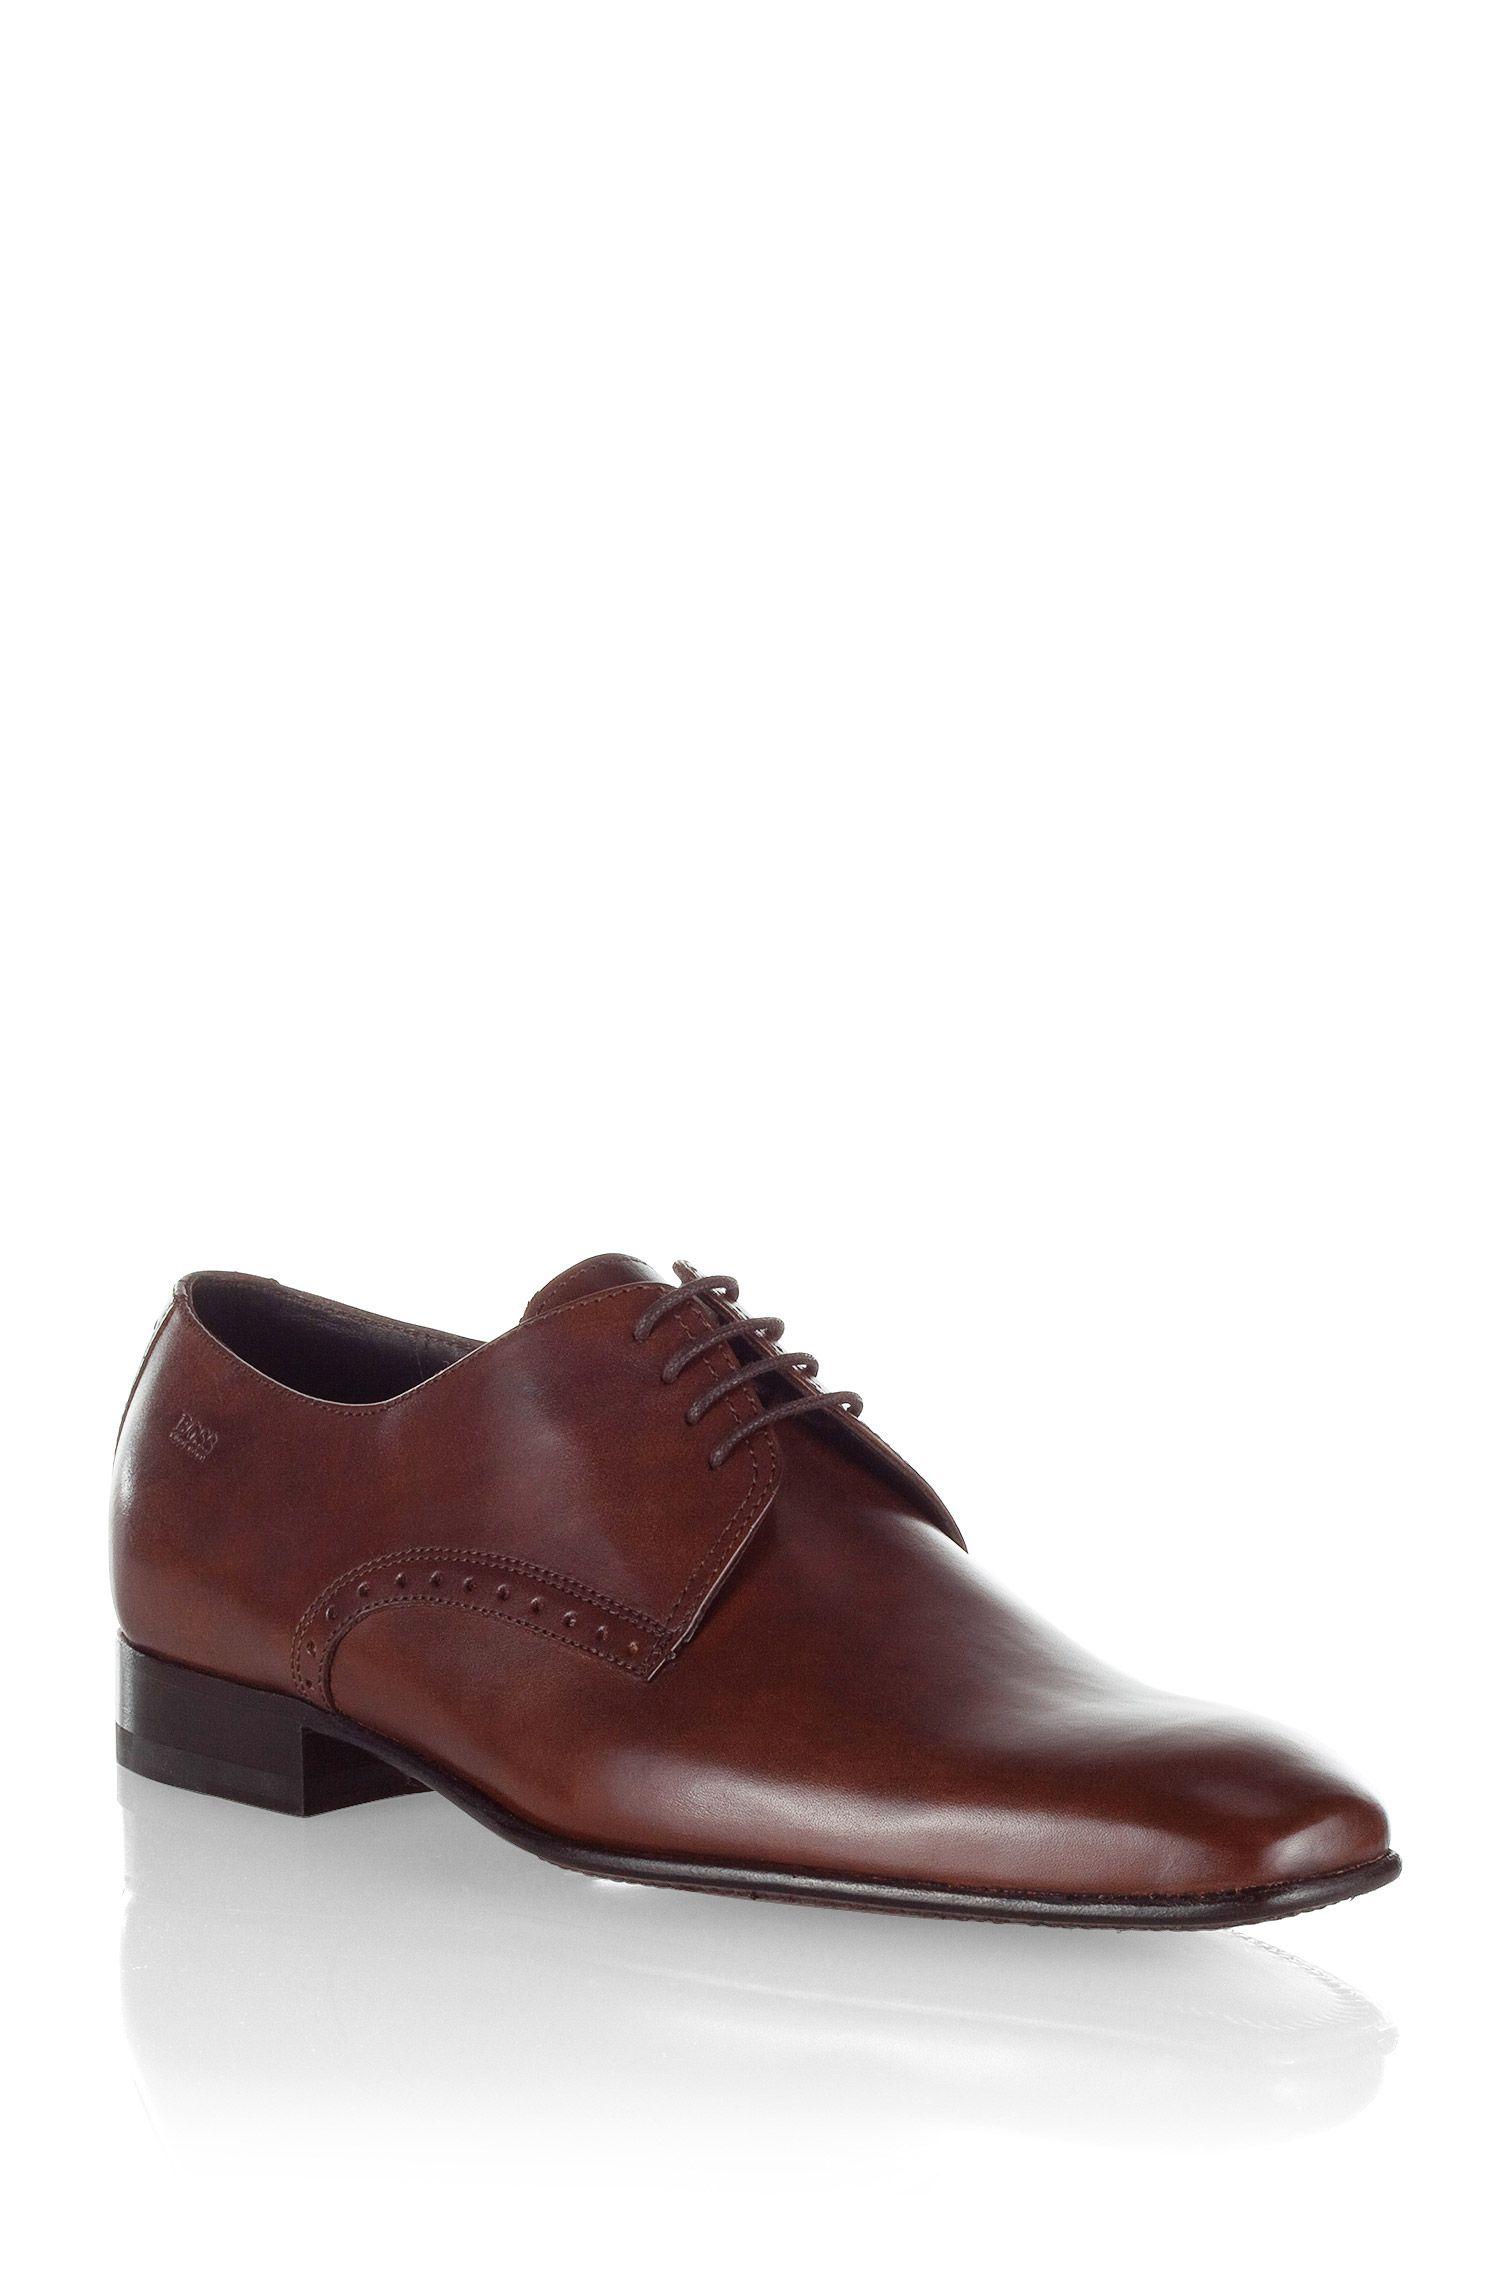 Chaussures Derby design en cuir, MELZIO